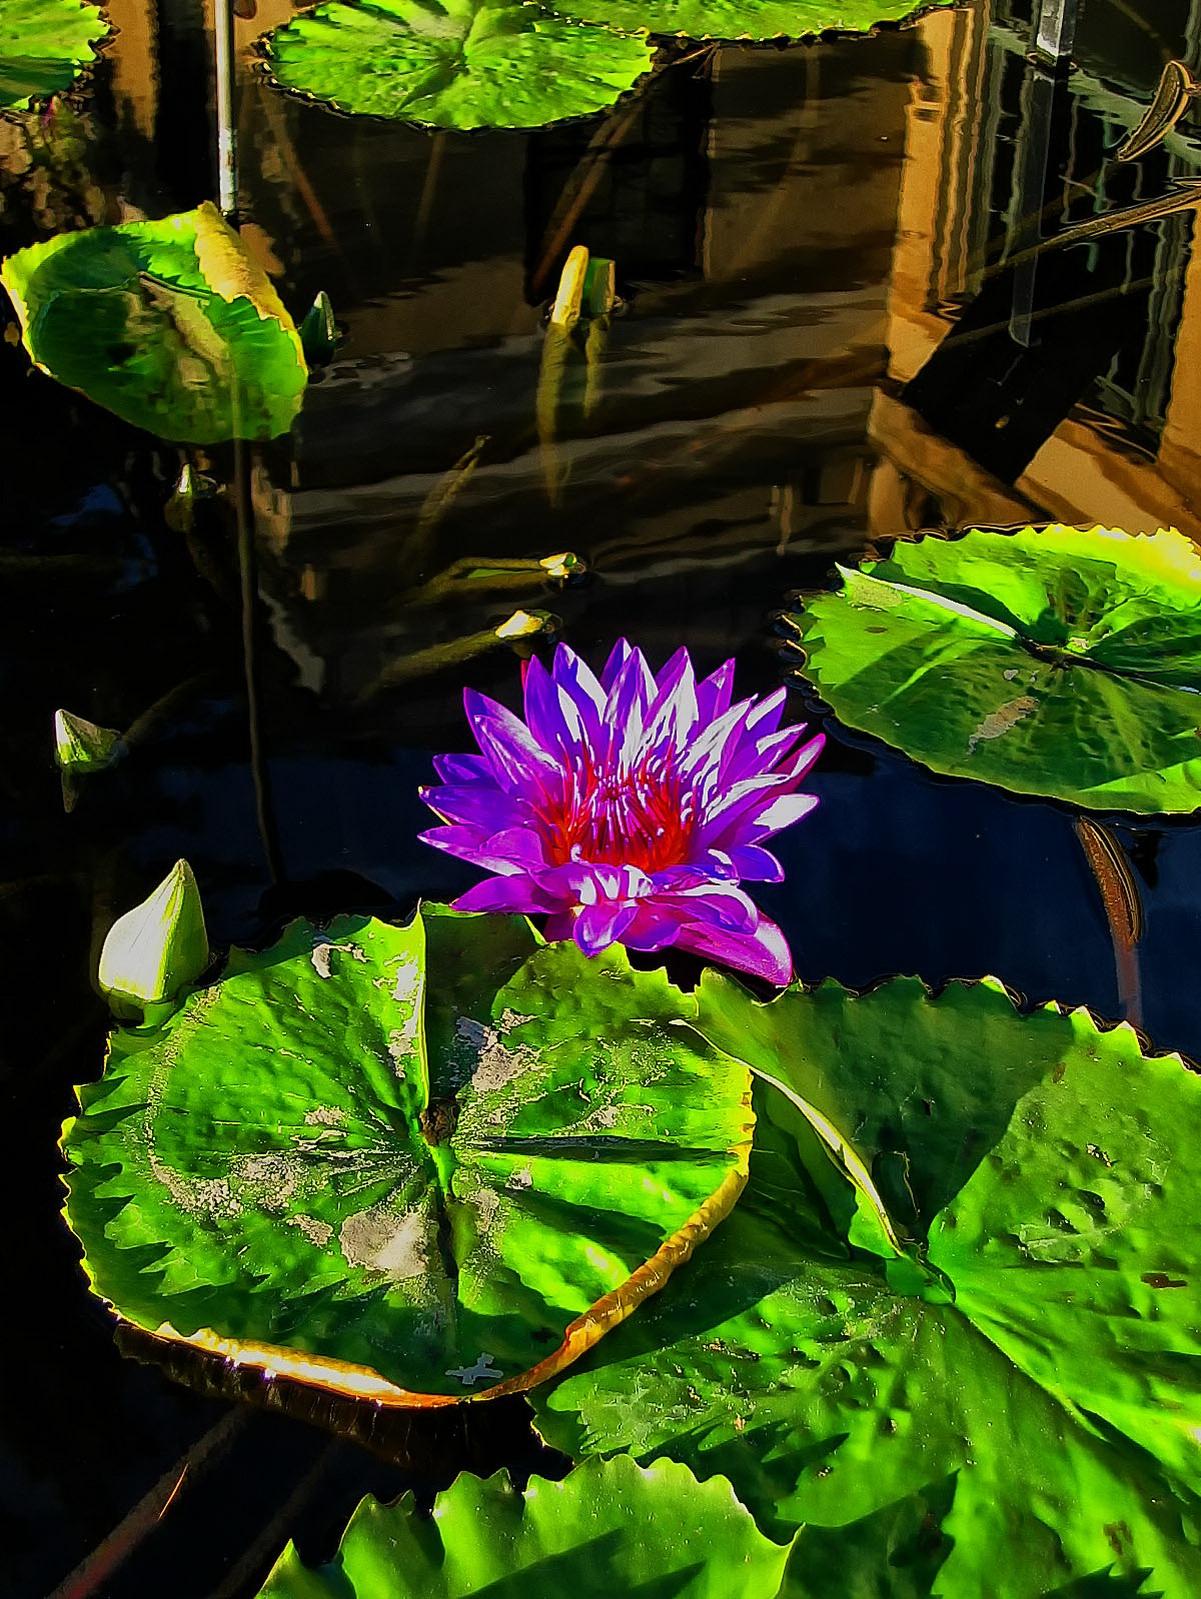 pennsylvania, kennett square, lotus, flower, water,, photo